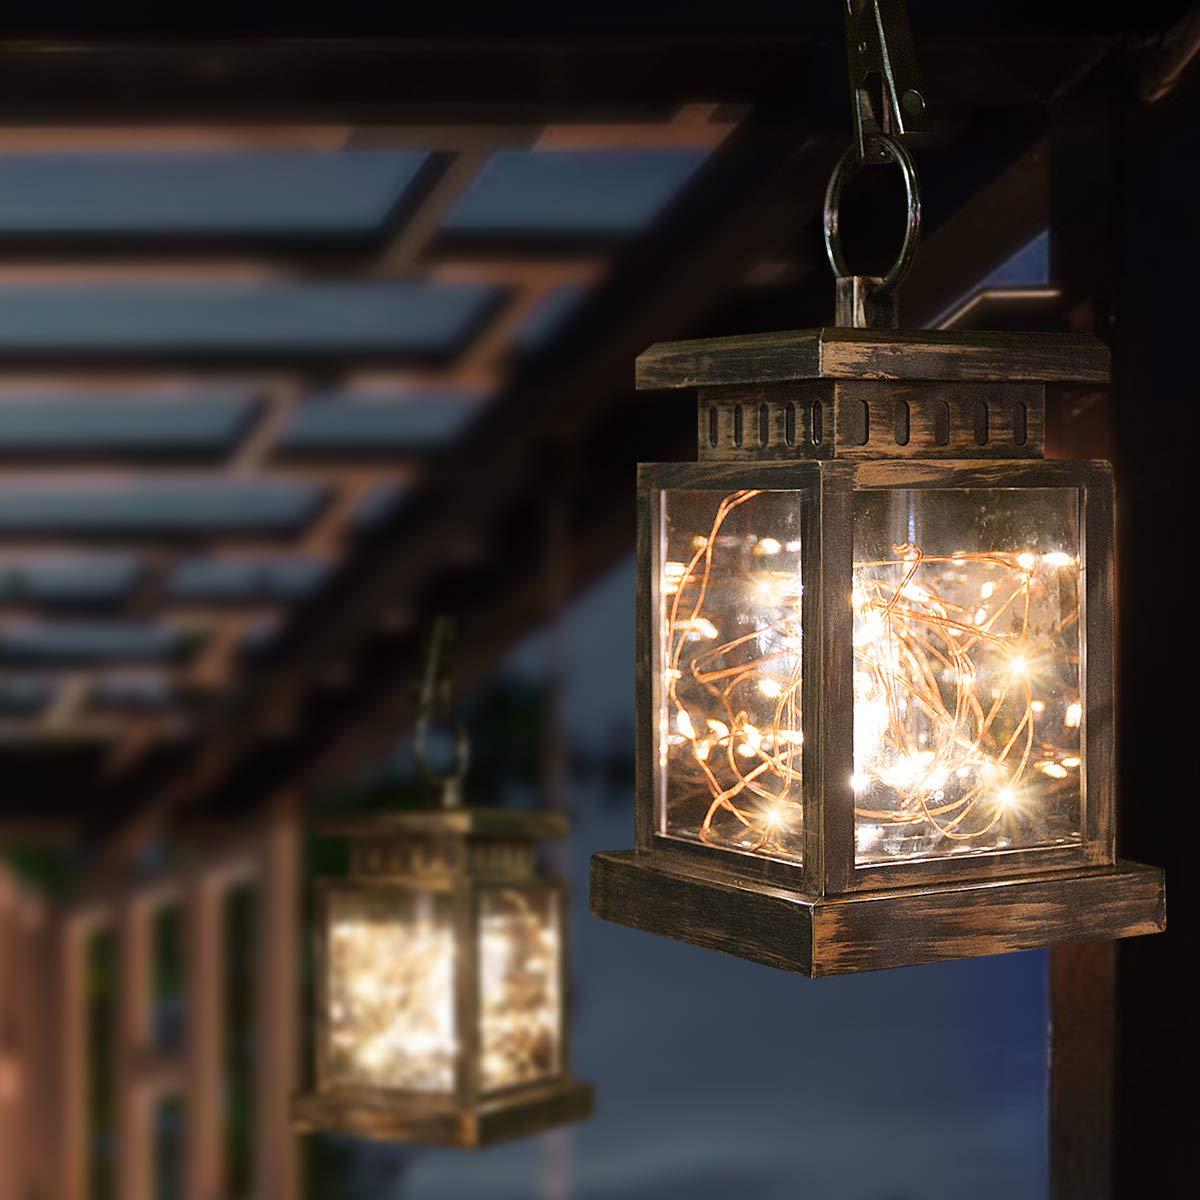 Homeleo Solar Outdoor Table Lantern, 30LED Warm White Vintage Decorative Copper String Lantern, Waterproof Solar Powered Outdoor Hanging Lights for Garden Patio Umbrella